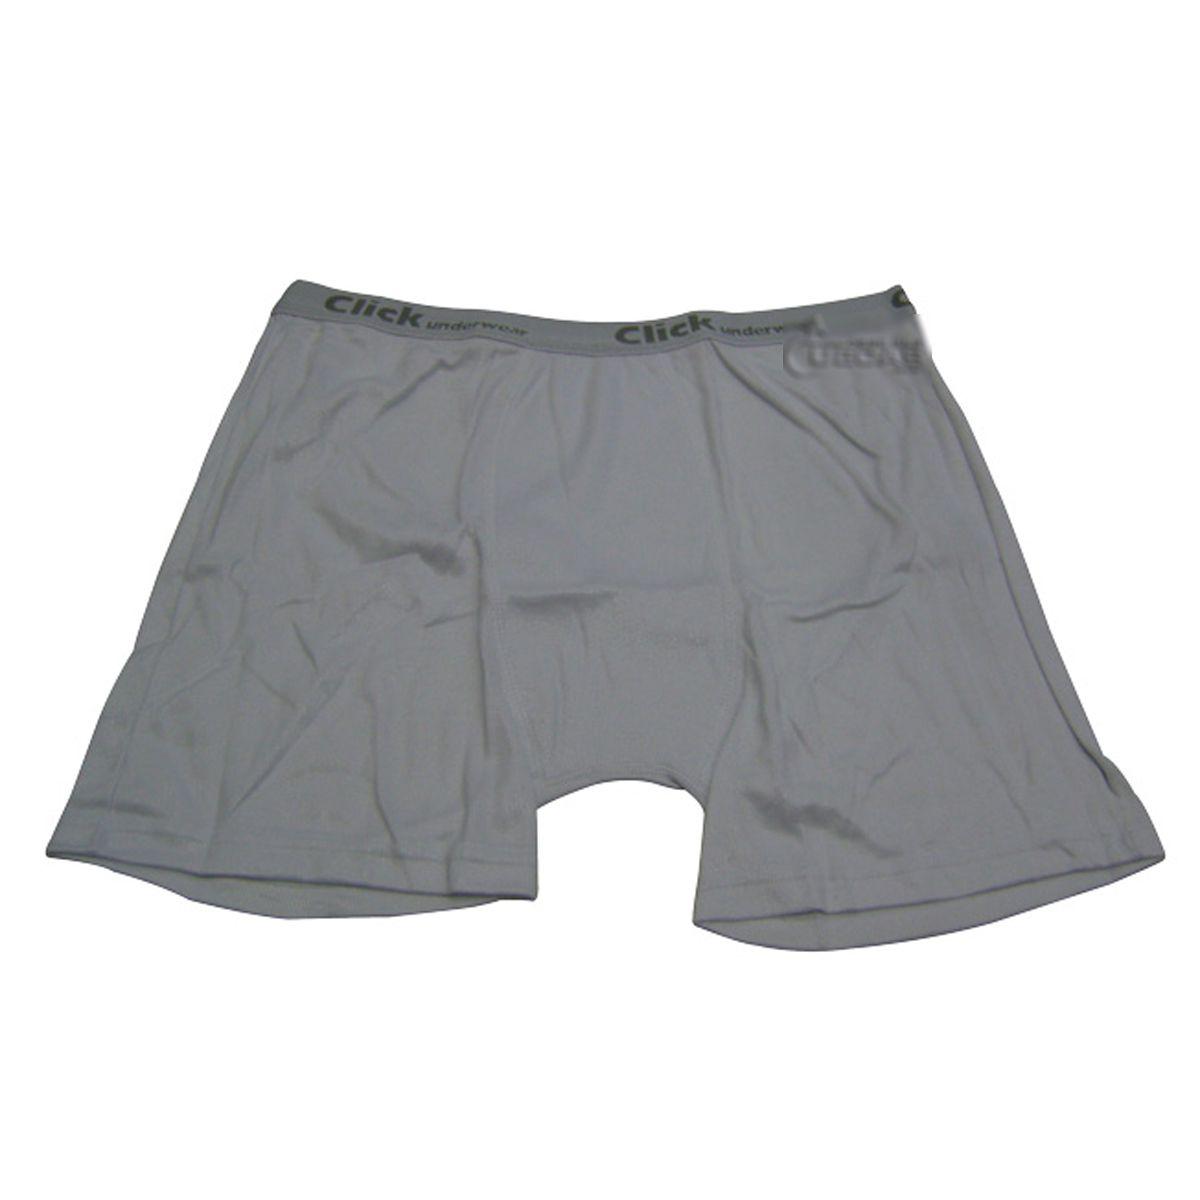 Cueca Click Boxer Big Cotton - Tamanhos Especiais Plus Size - 183